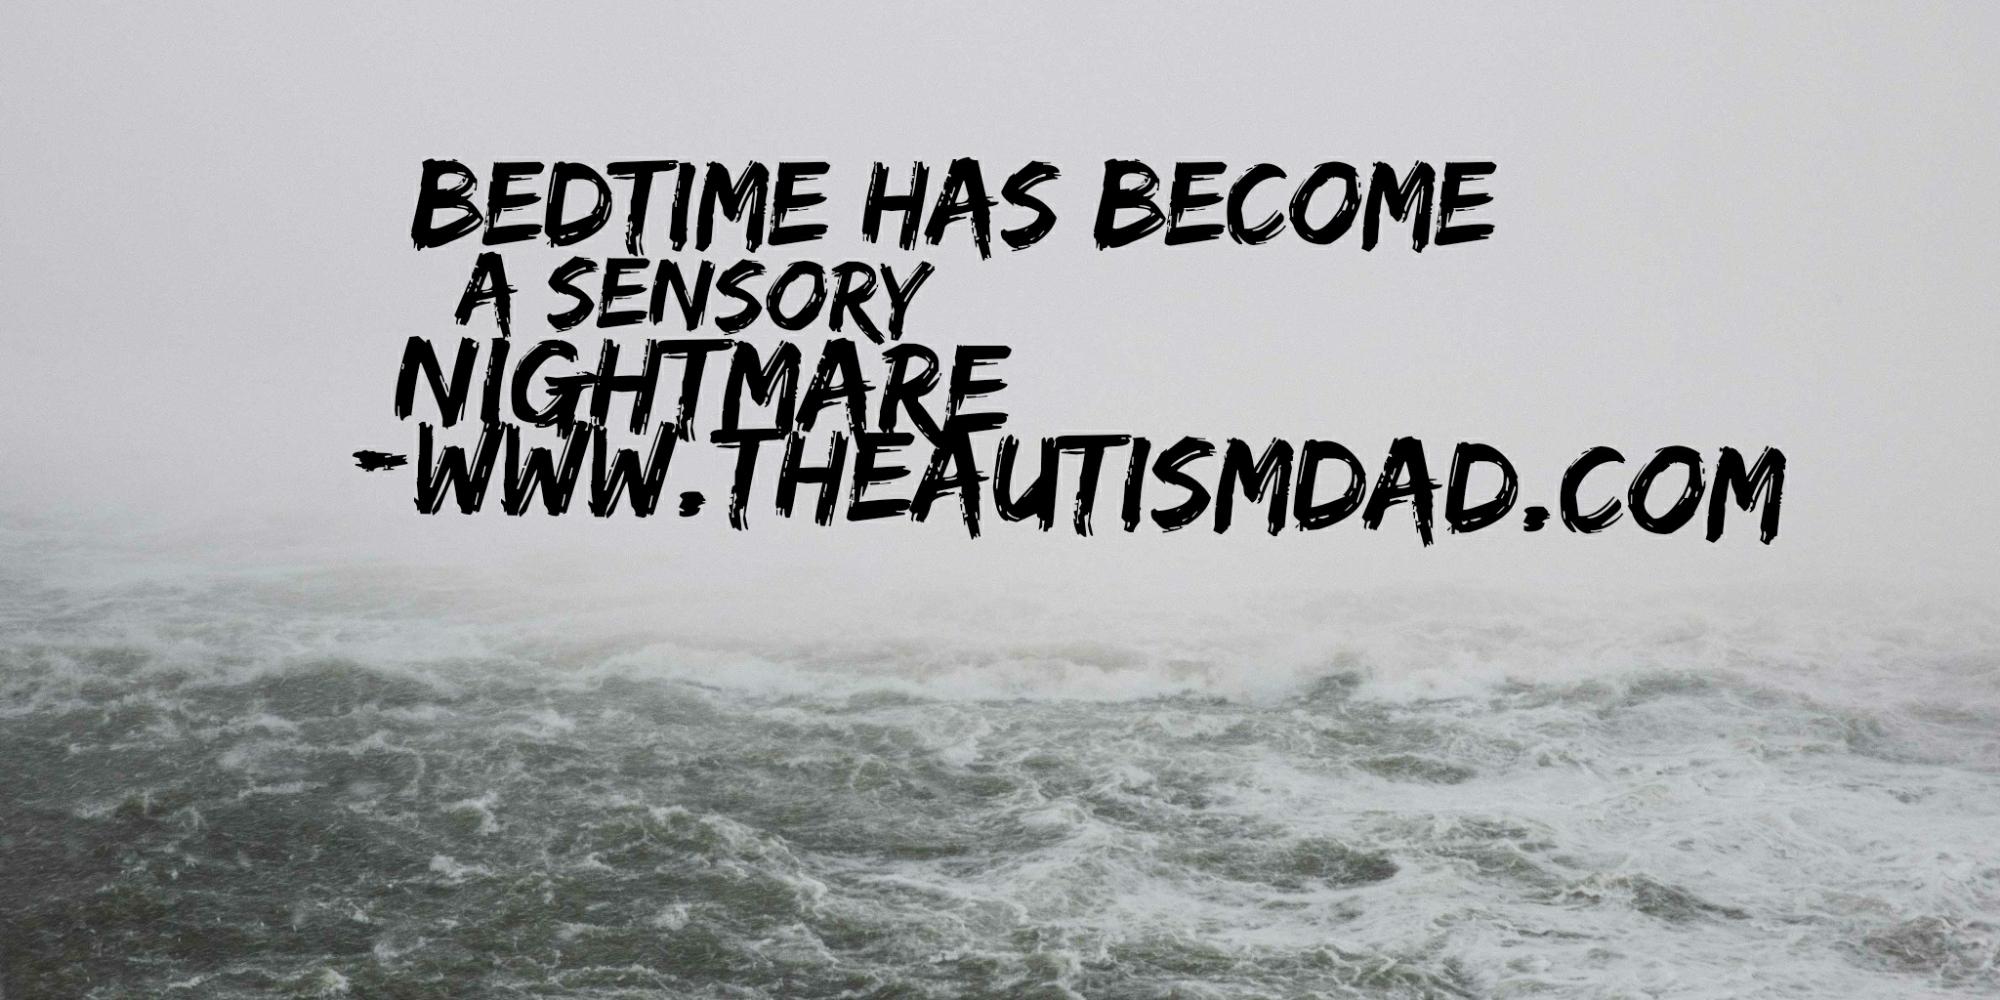 Bedtime has become a sensory nightmare